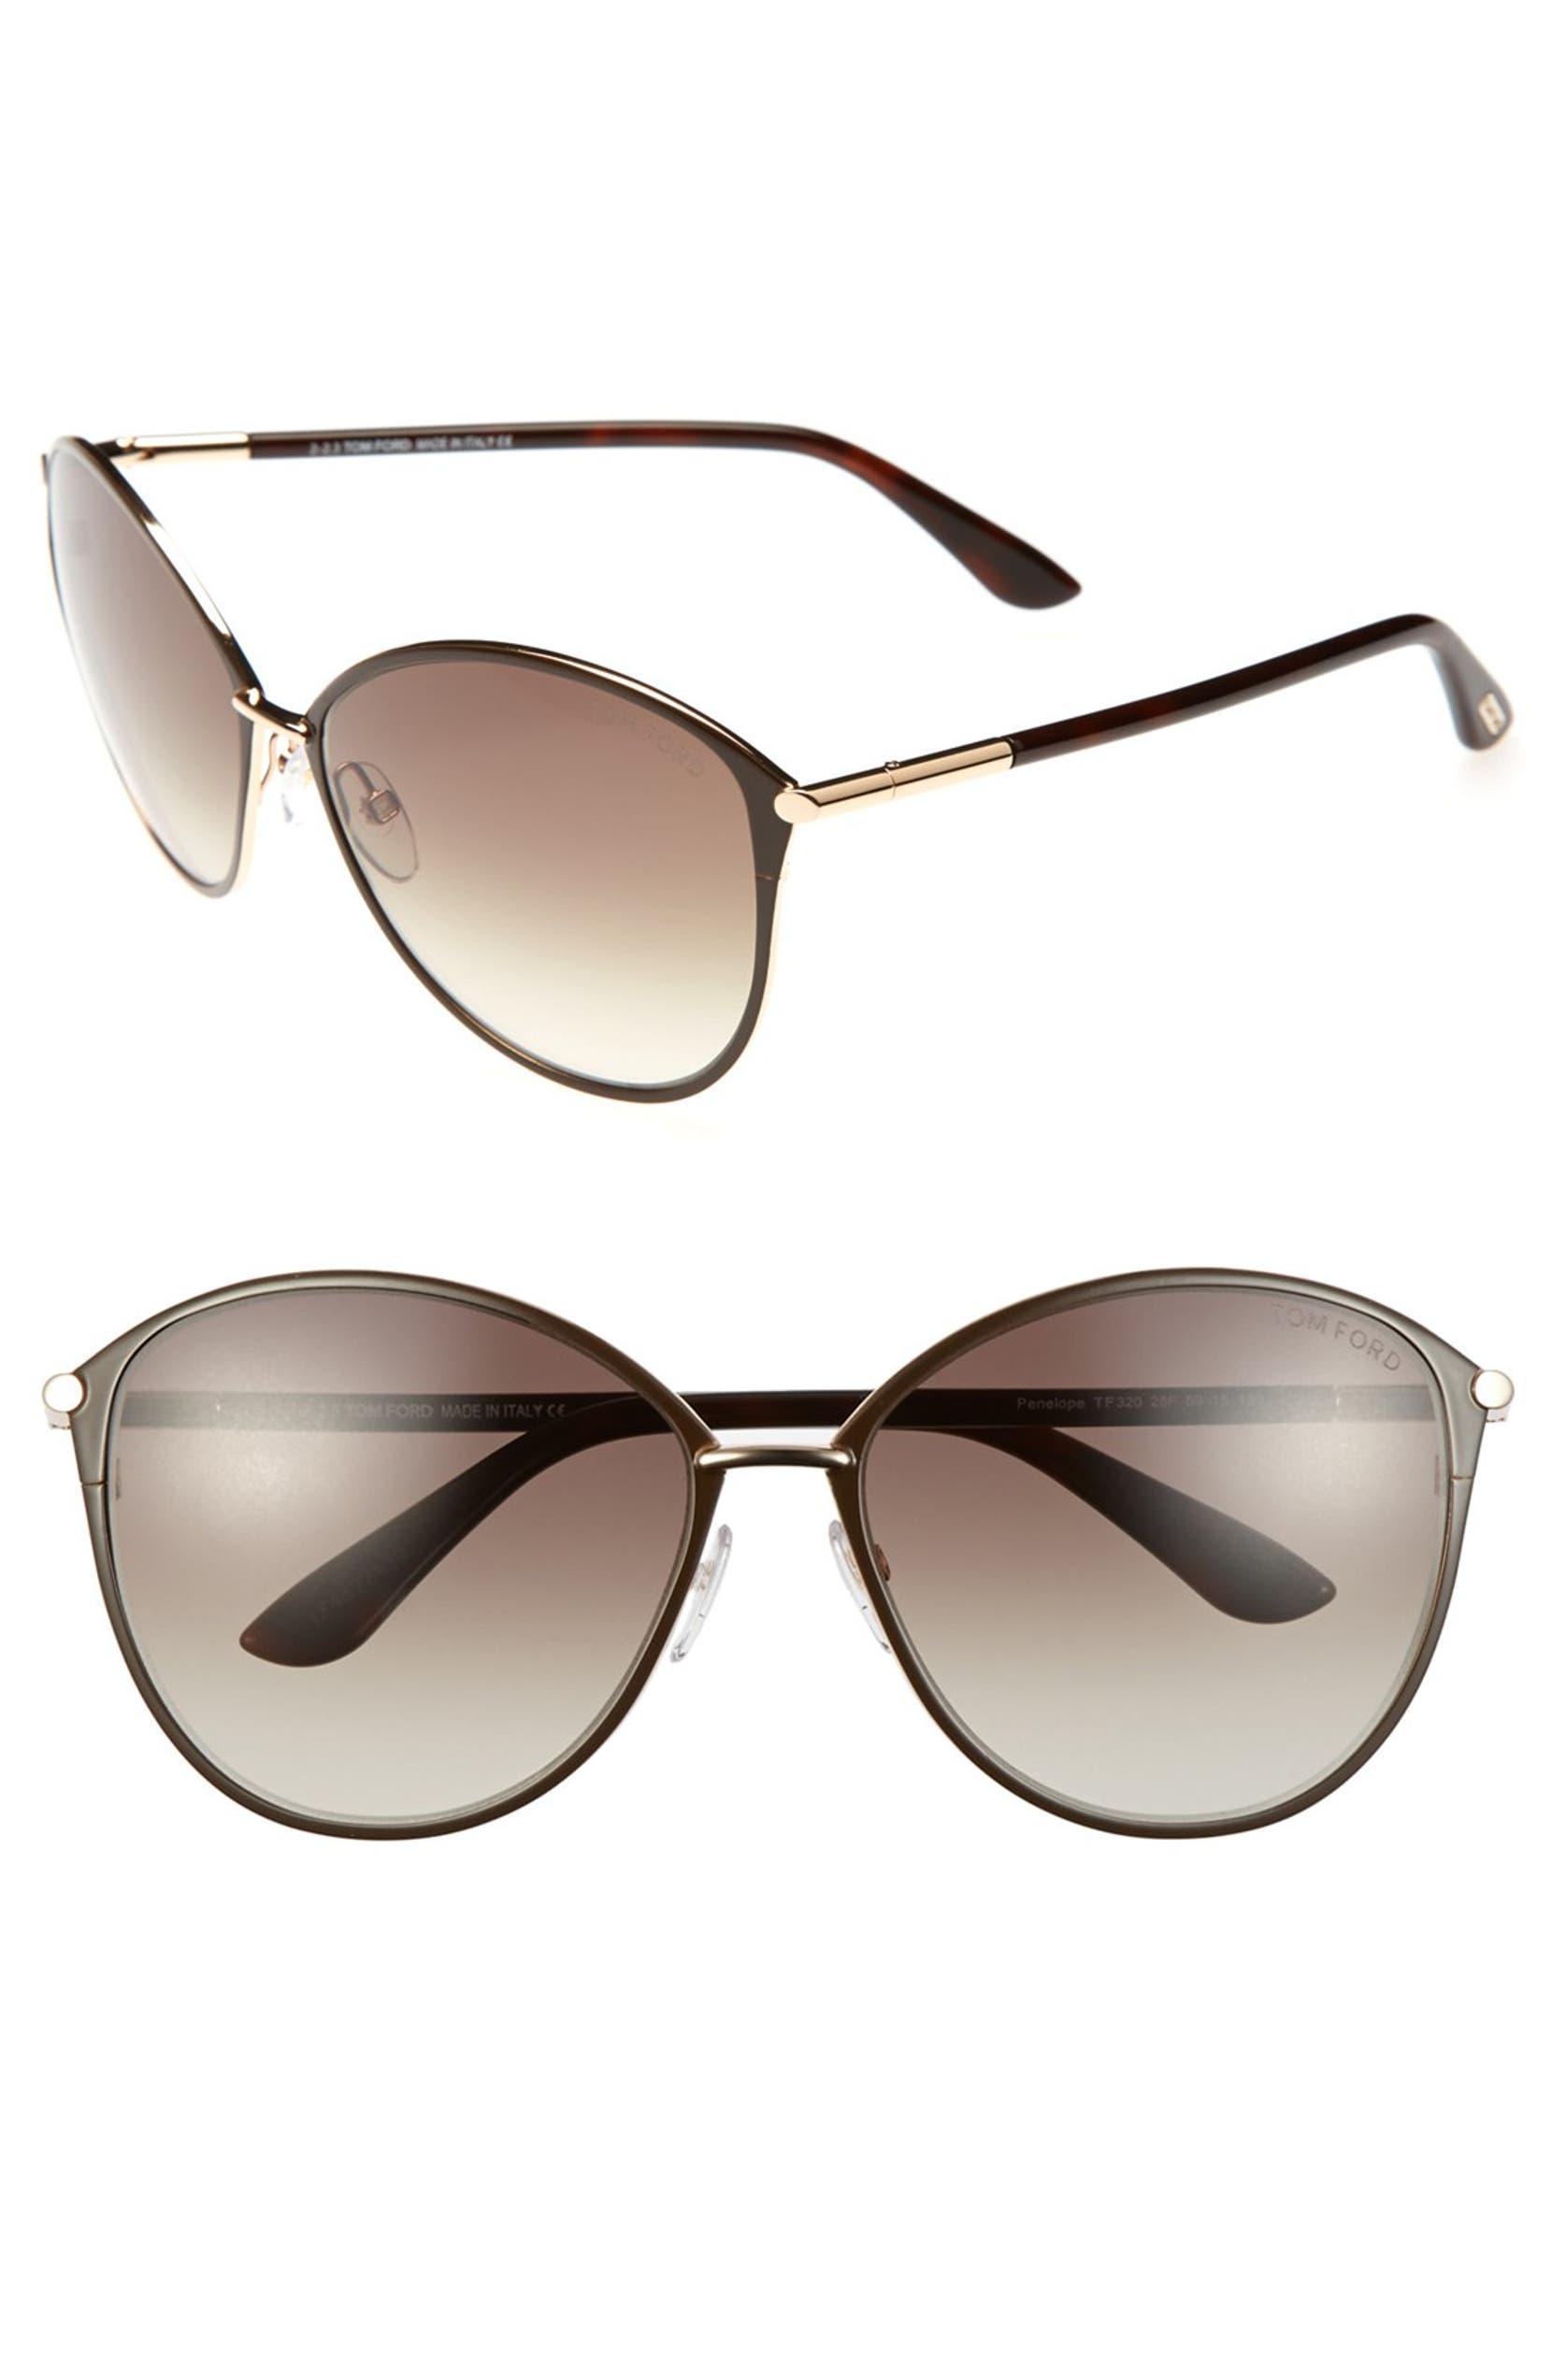 9be25f152ac Tom Ford Penelope 59mm Gradient Cat Eye Sunglasses